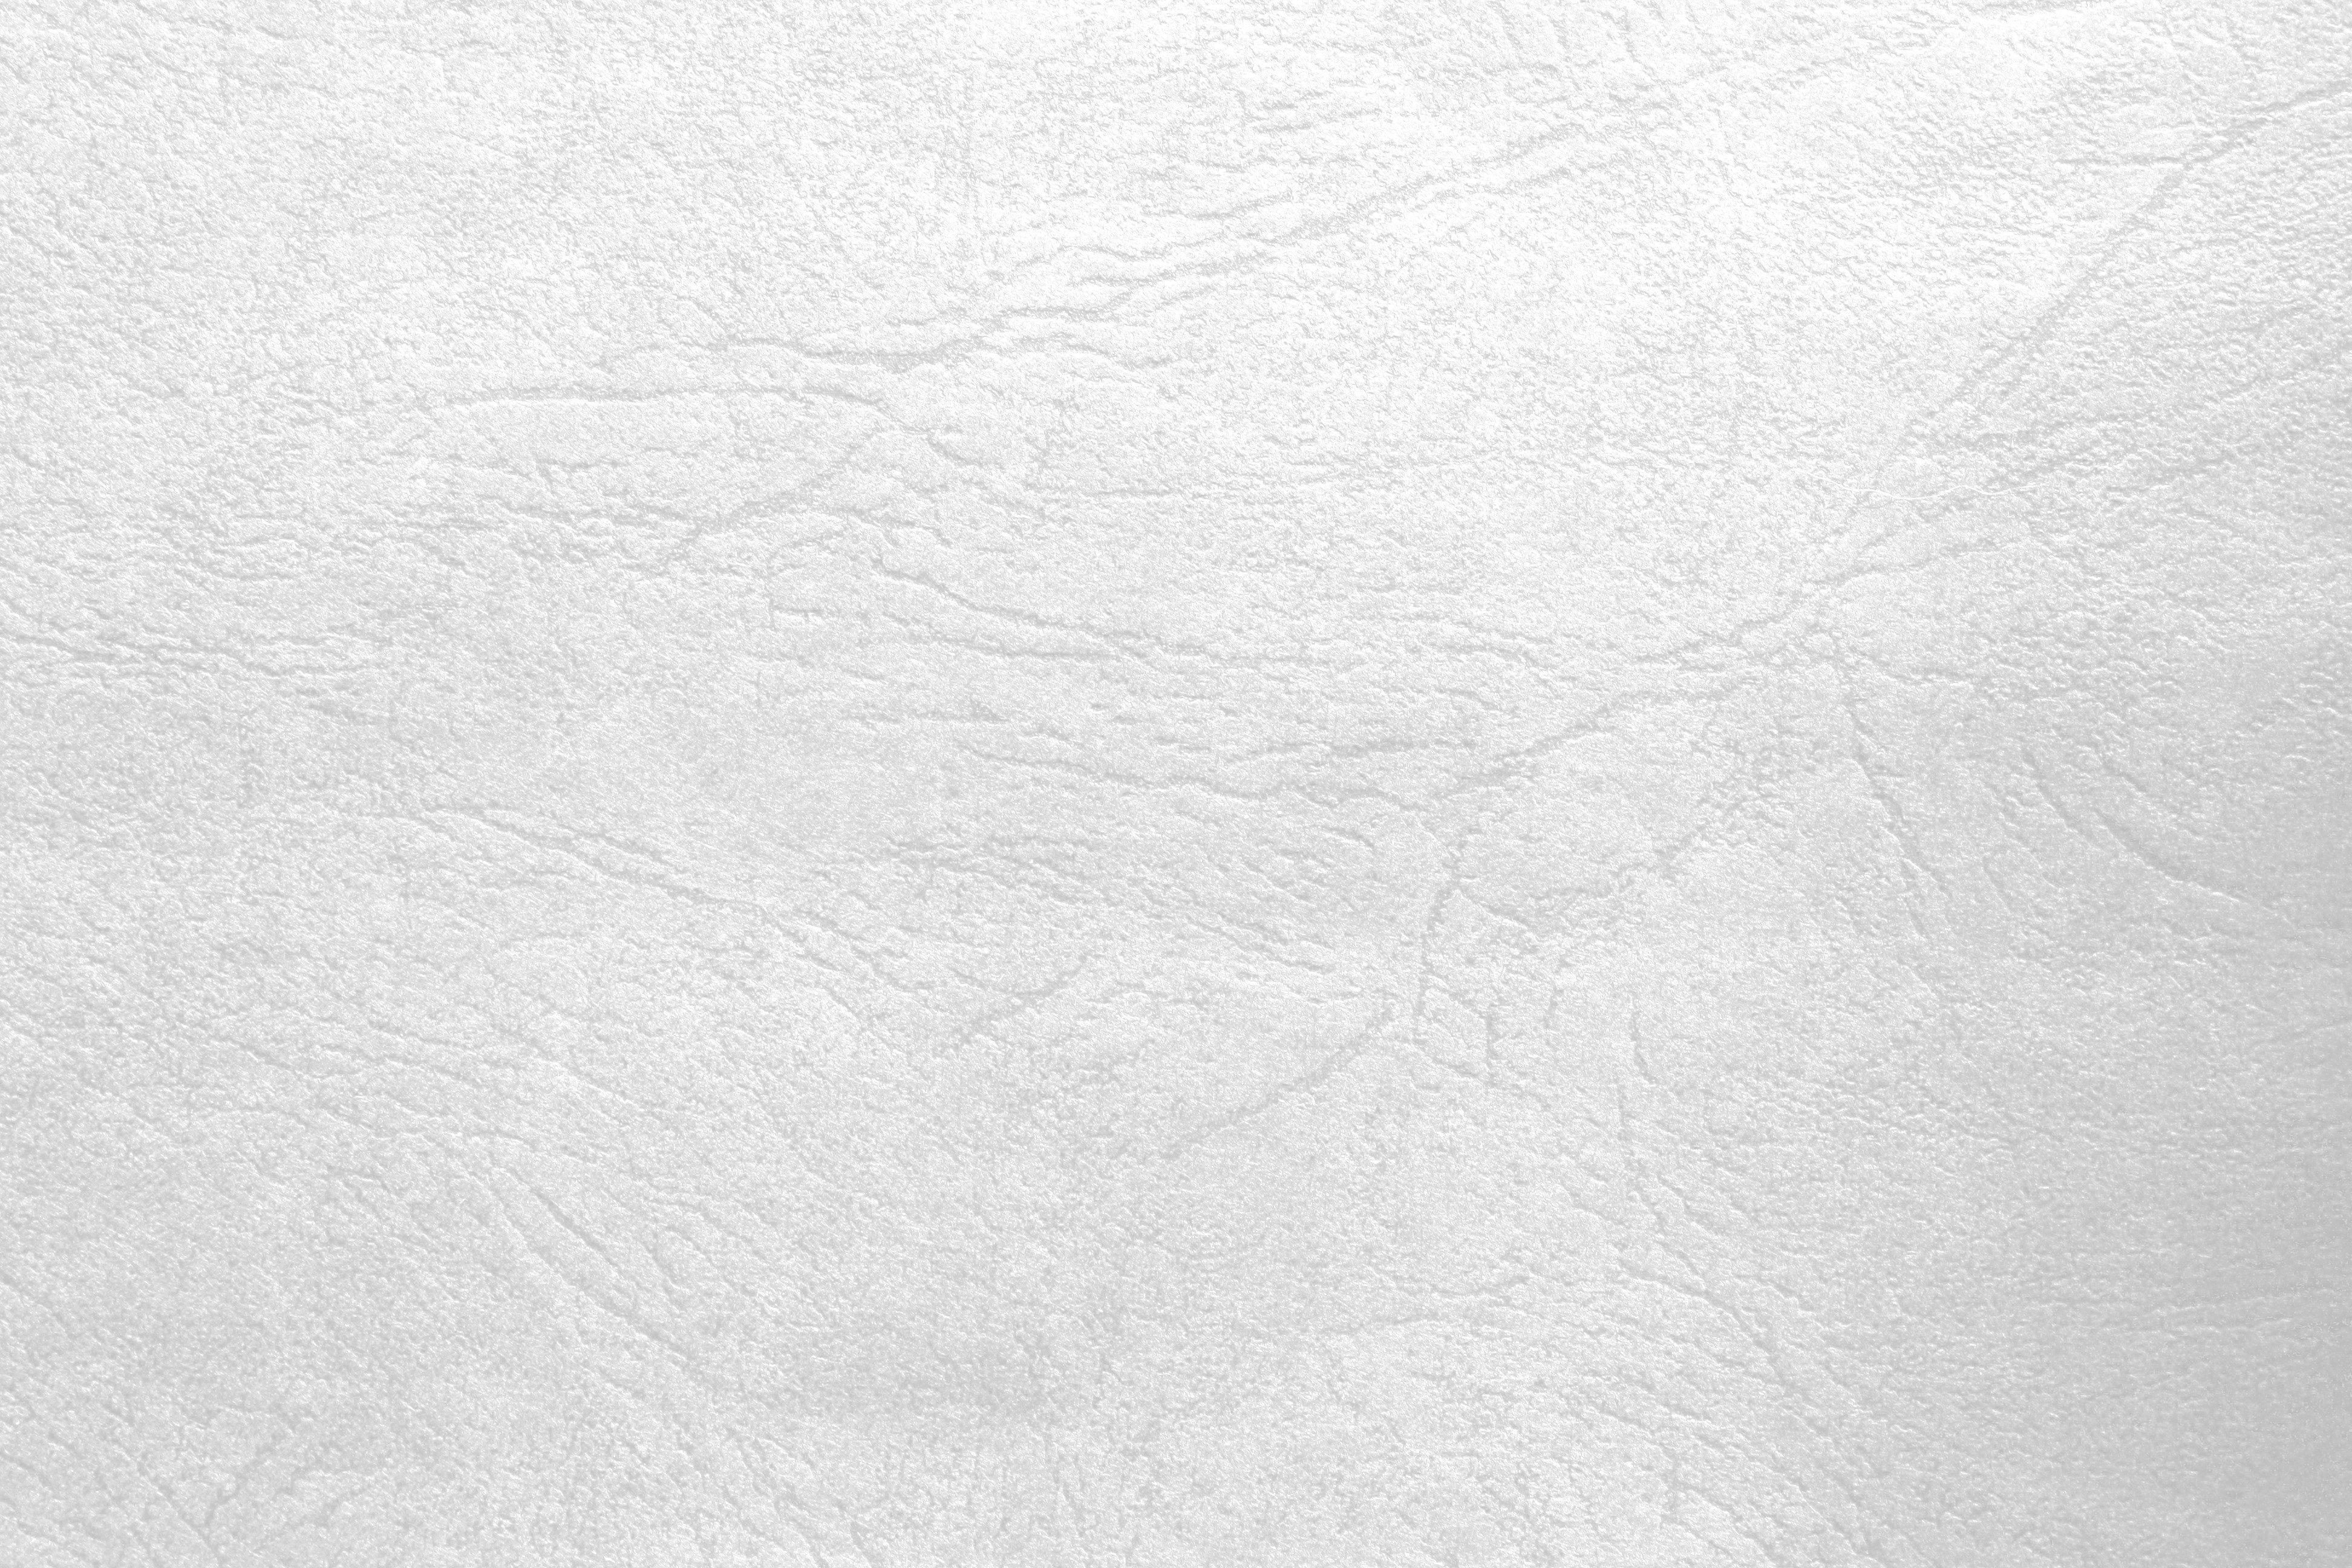 White Leather Texture- new desktop background :) | texture ... for White Leather Texture Hd  111bof